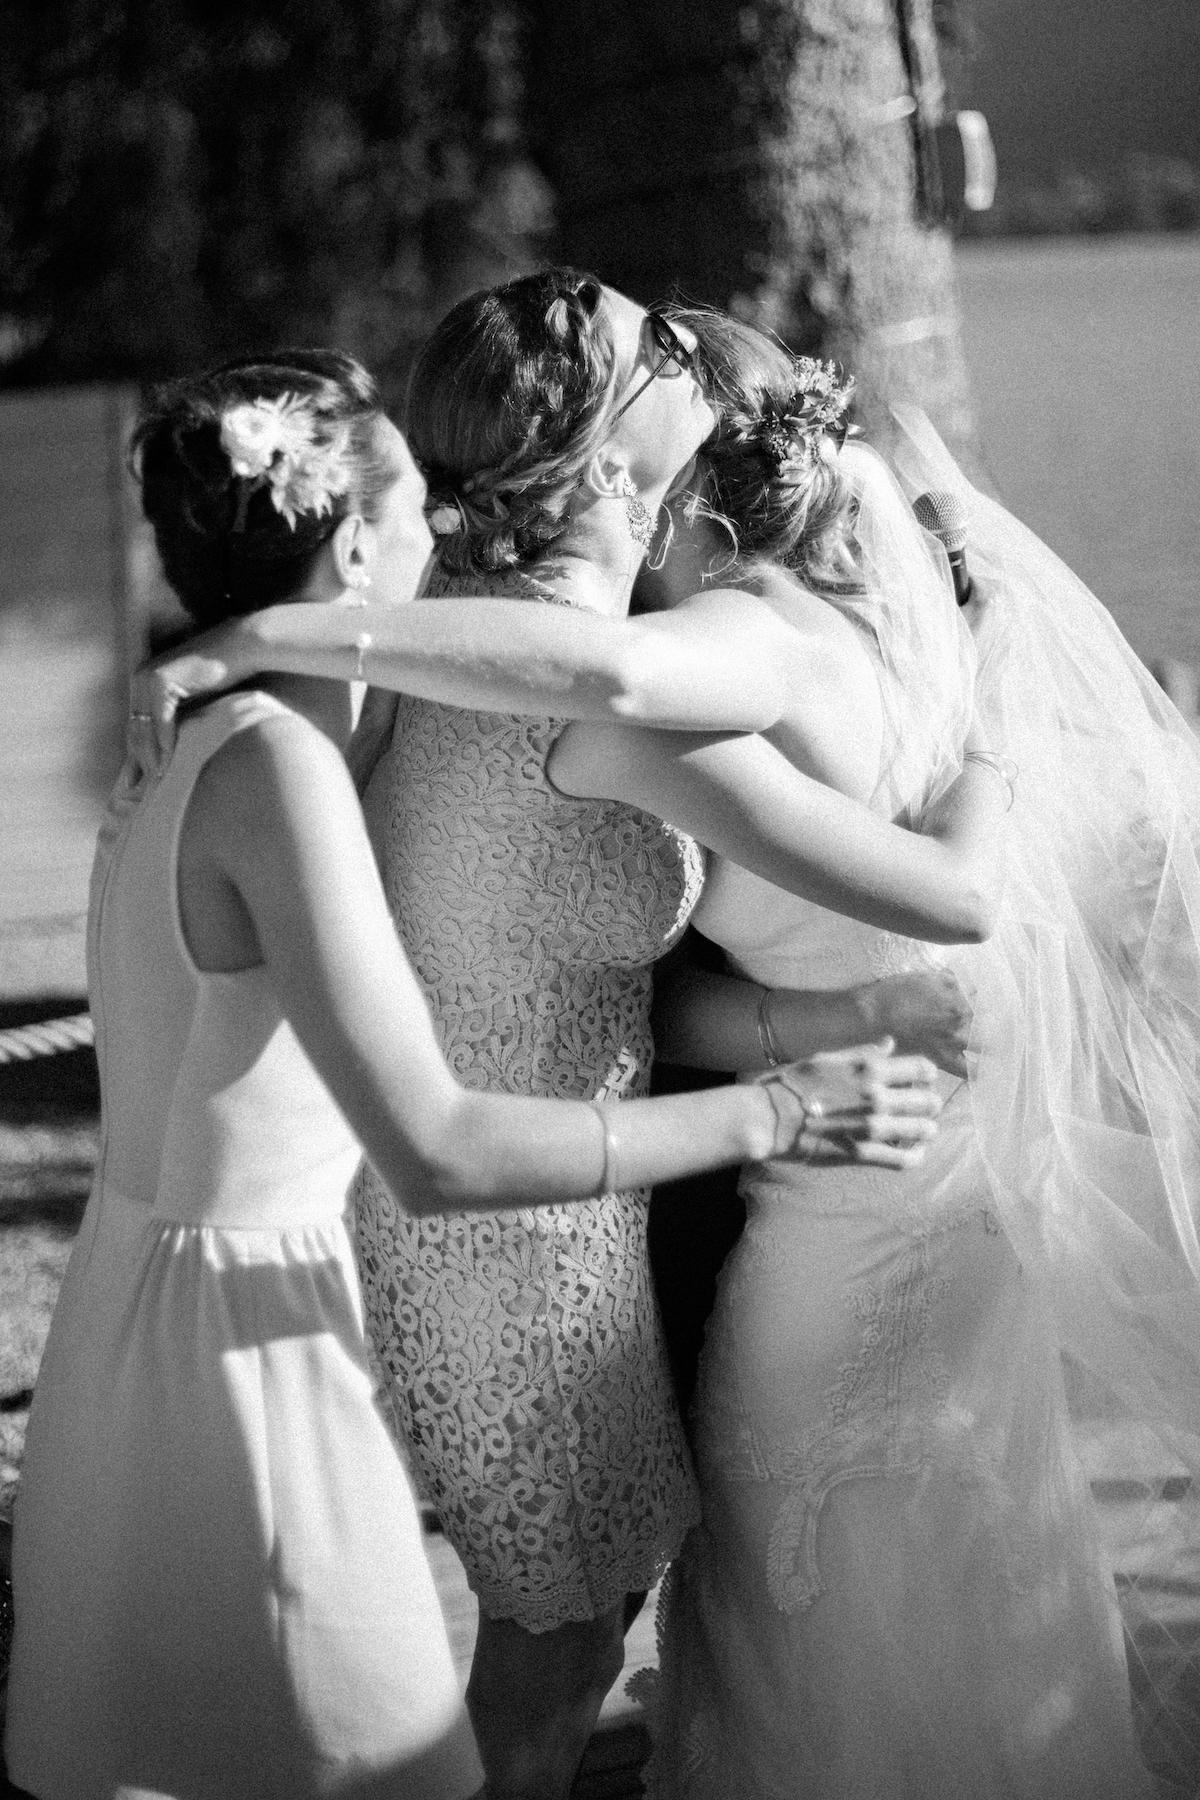 annecy-wedding-photos-190.jpg